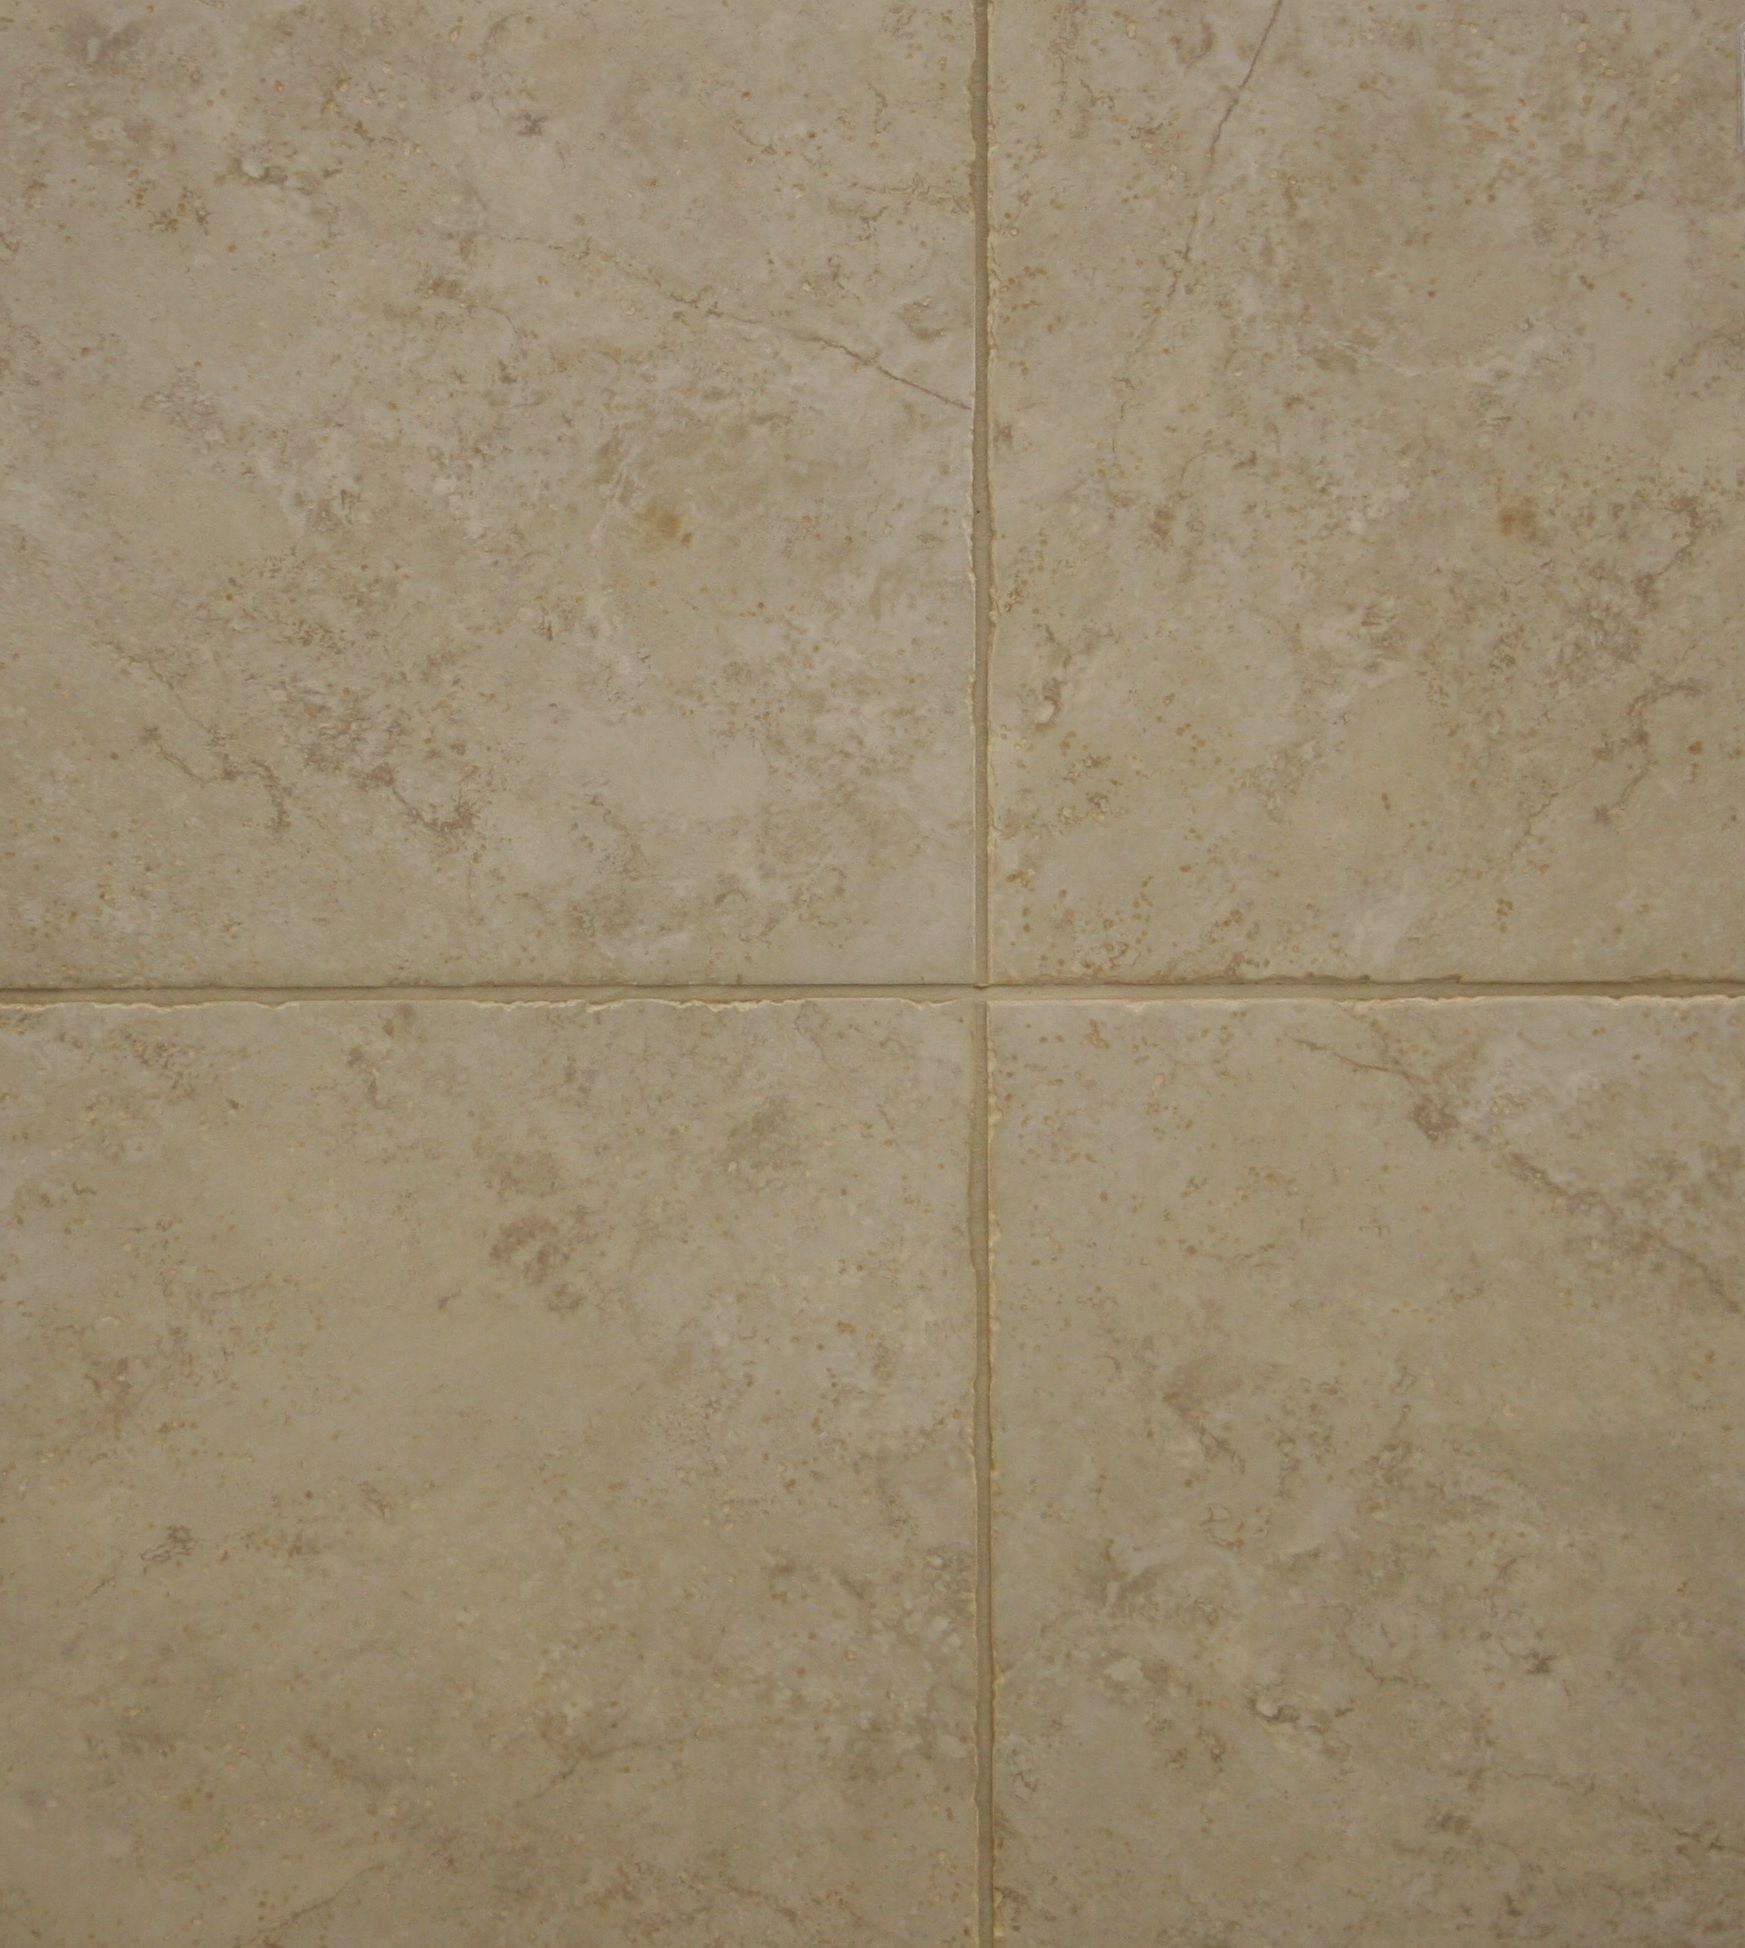 Textured porcelain floor tiles tile design ideas 16x16 porcelain floor tile pamesa newport beige 18x18 flooring dailygadgetfo Choice Image